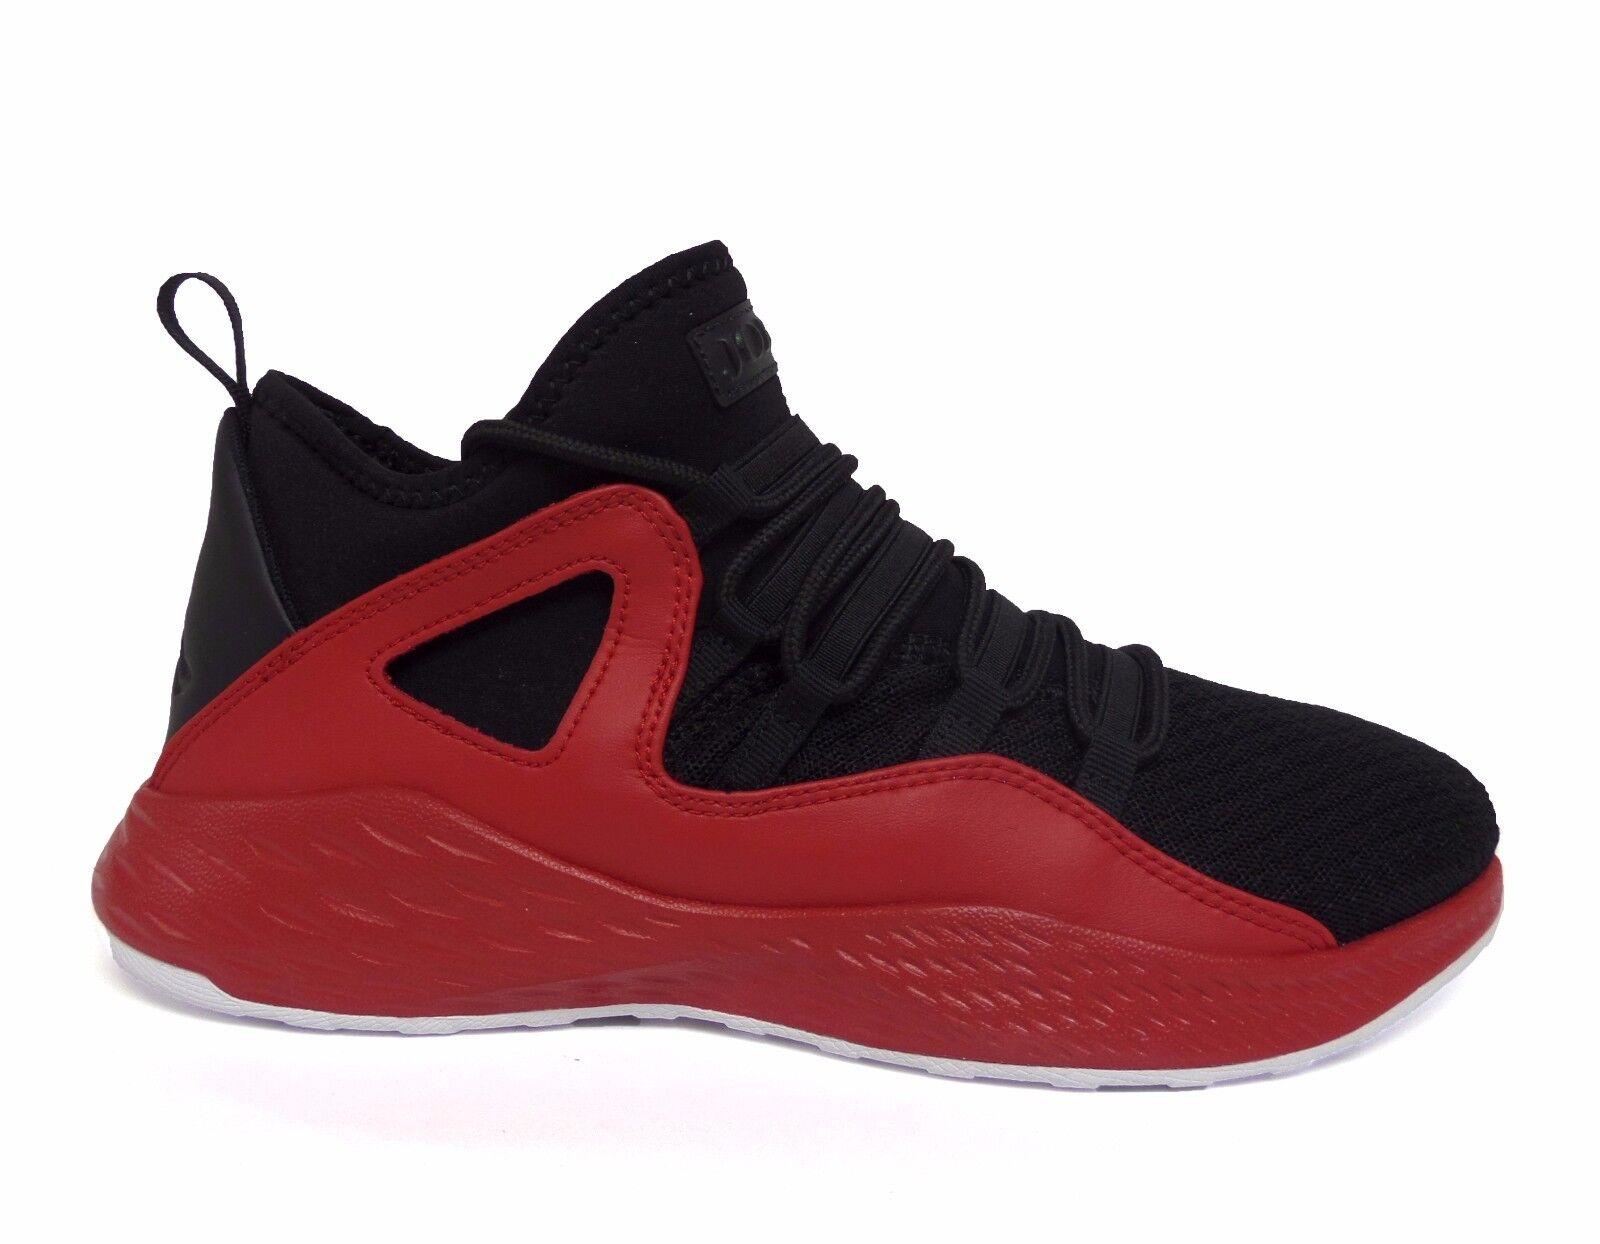 Nike Men's Black/Gym Air Jordan FORMULA 23 Shoes Black/Gym Men's Red 881465-001 b 926aaa